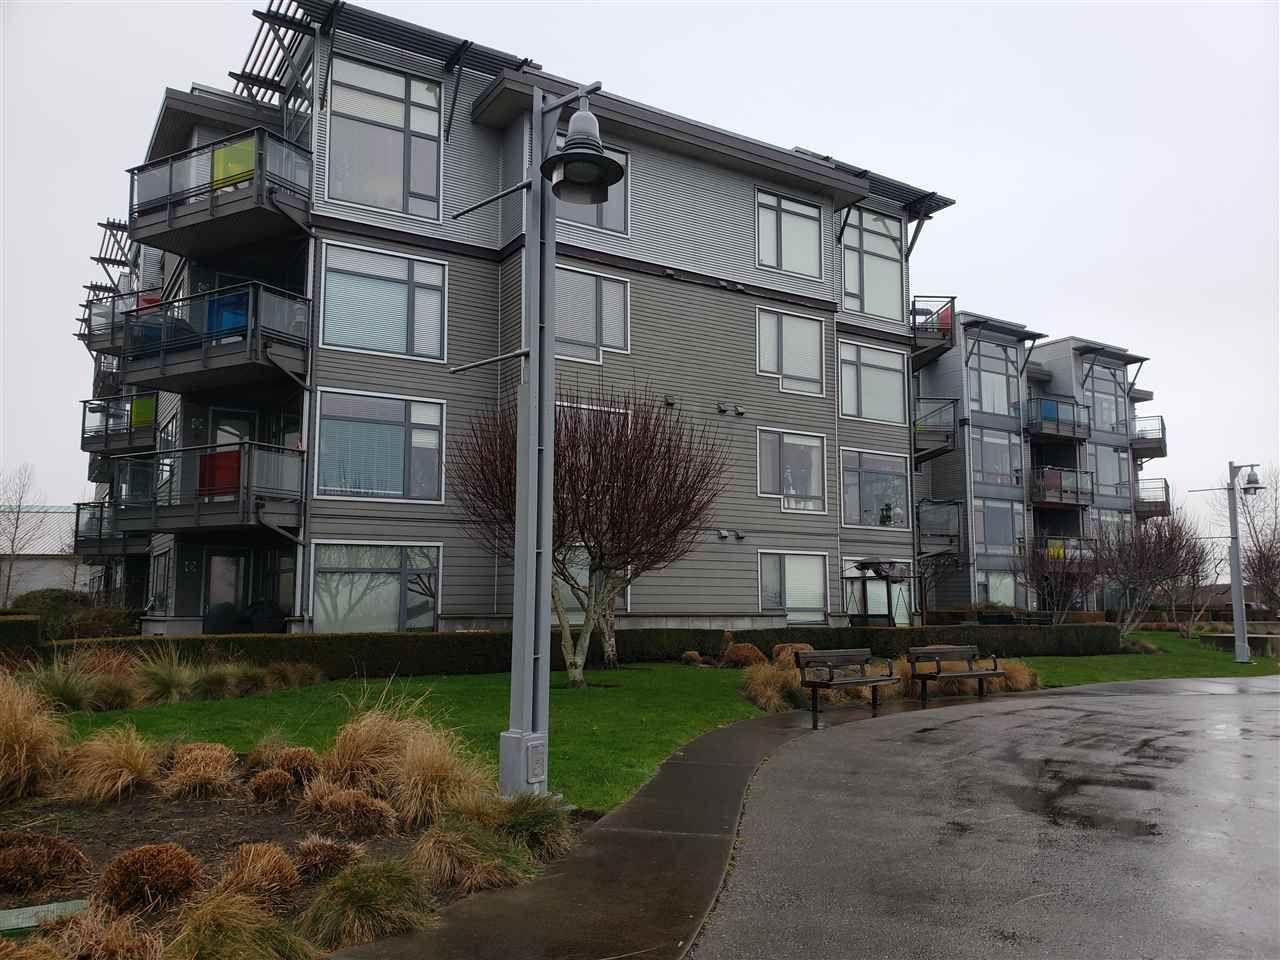 Exterior building view from Riverport Walkway